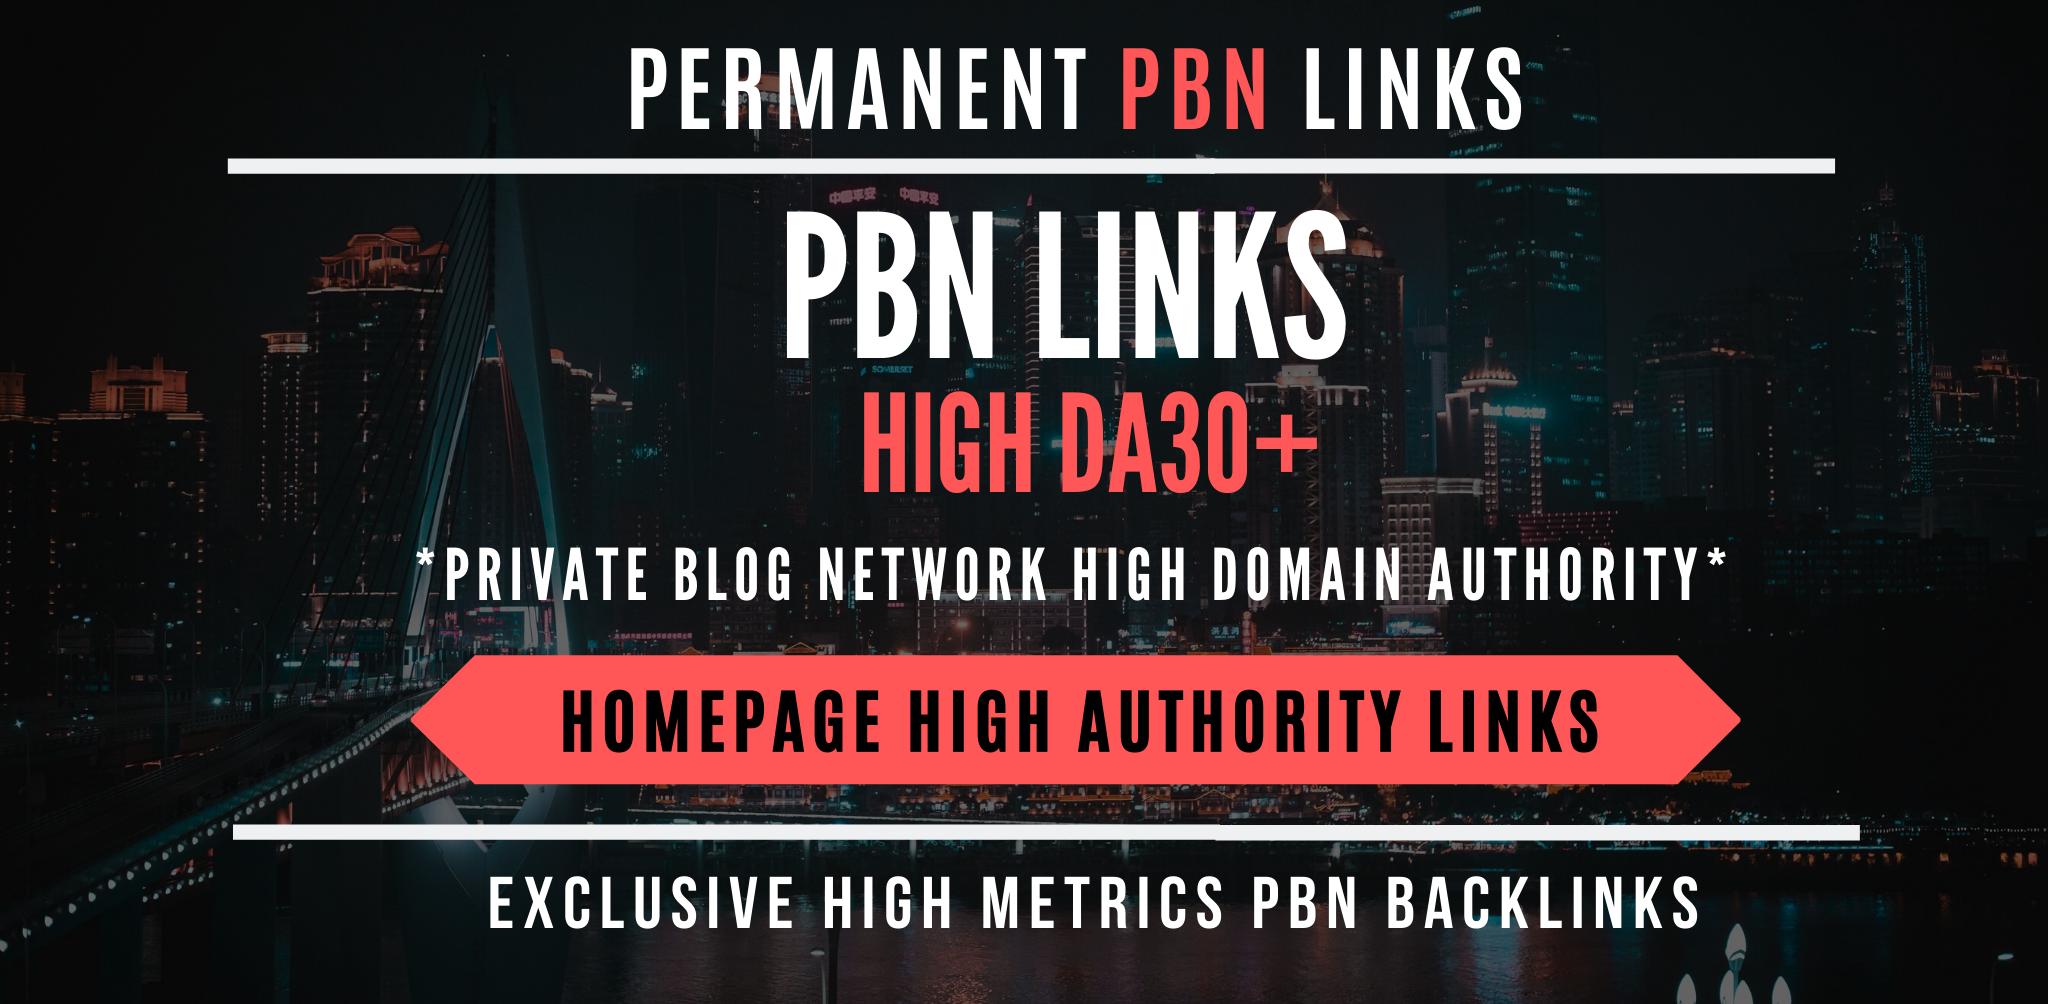 Permanent 100 Contextual Backlink from high DA 20-30+ / TF 15-25+ PBN